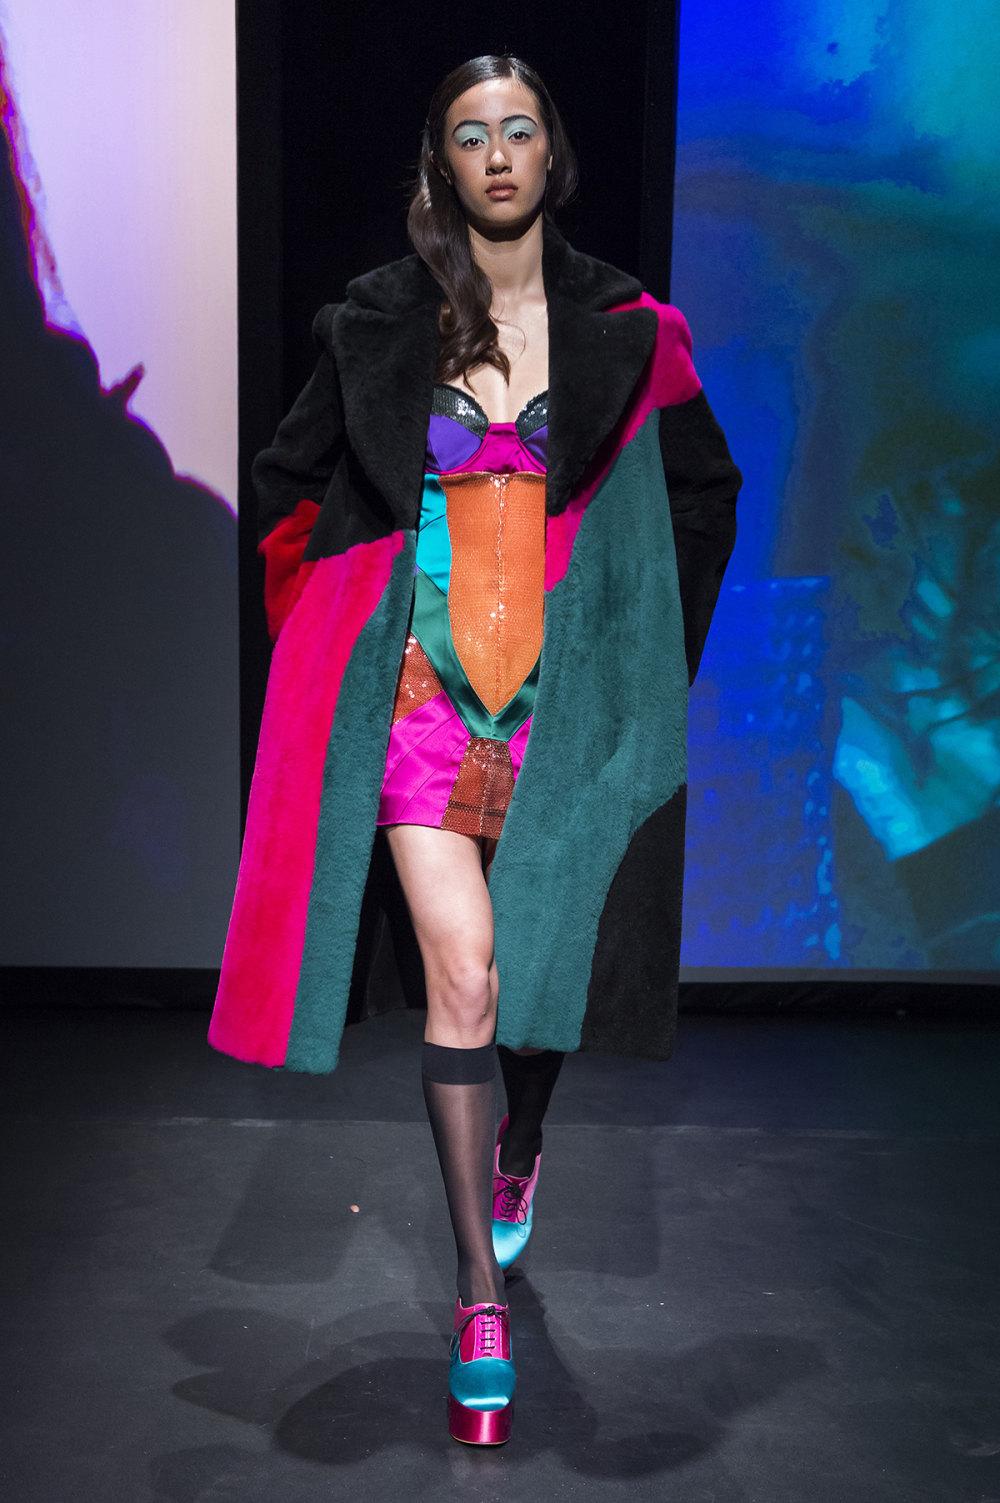 16Arlington时装系列标志性的時尚单色西装外还有更大胆的版本-9.jpg